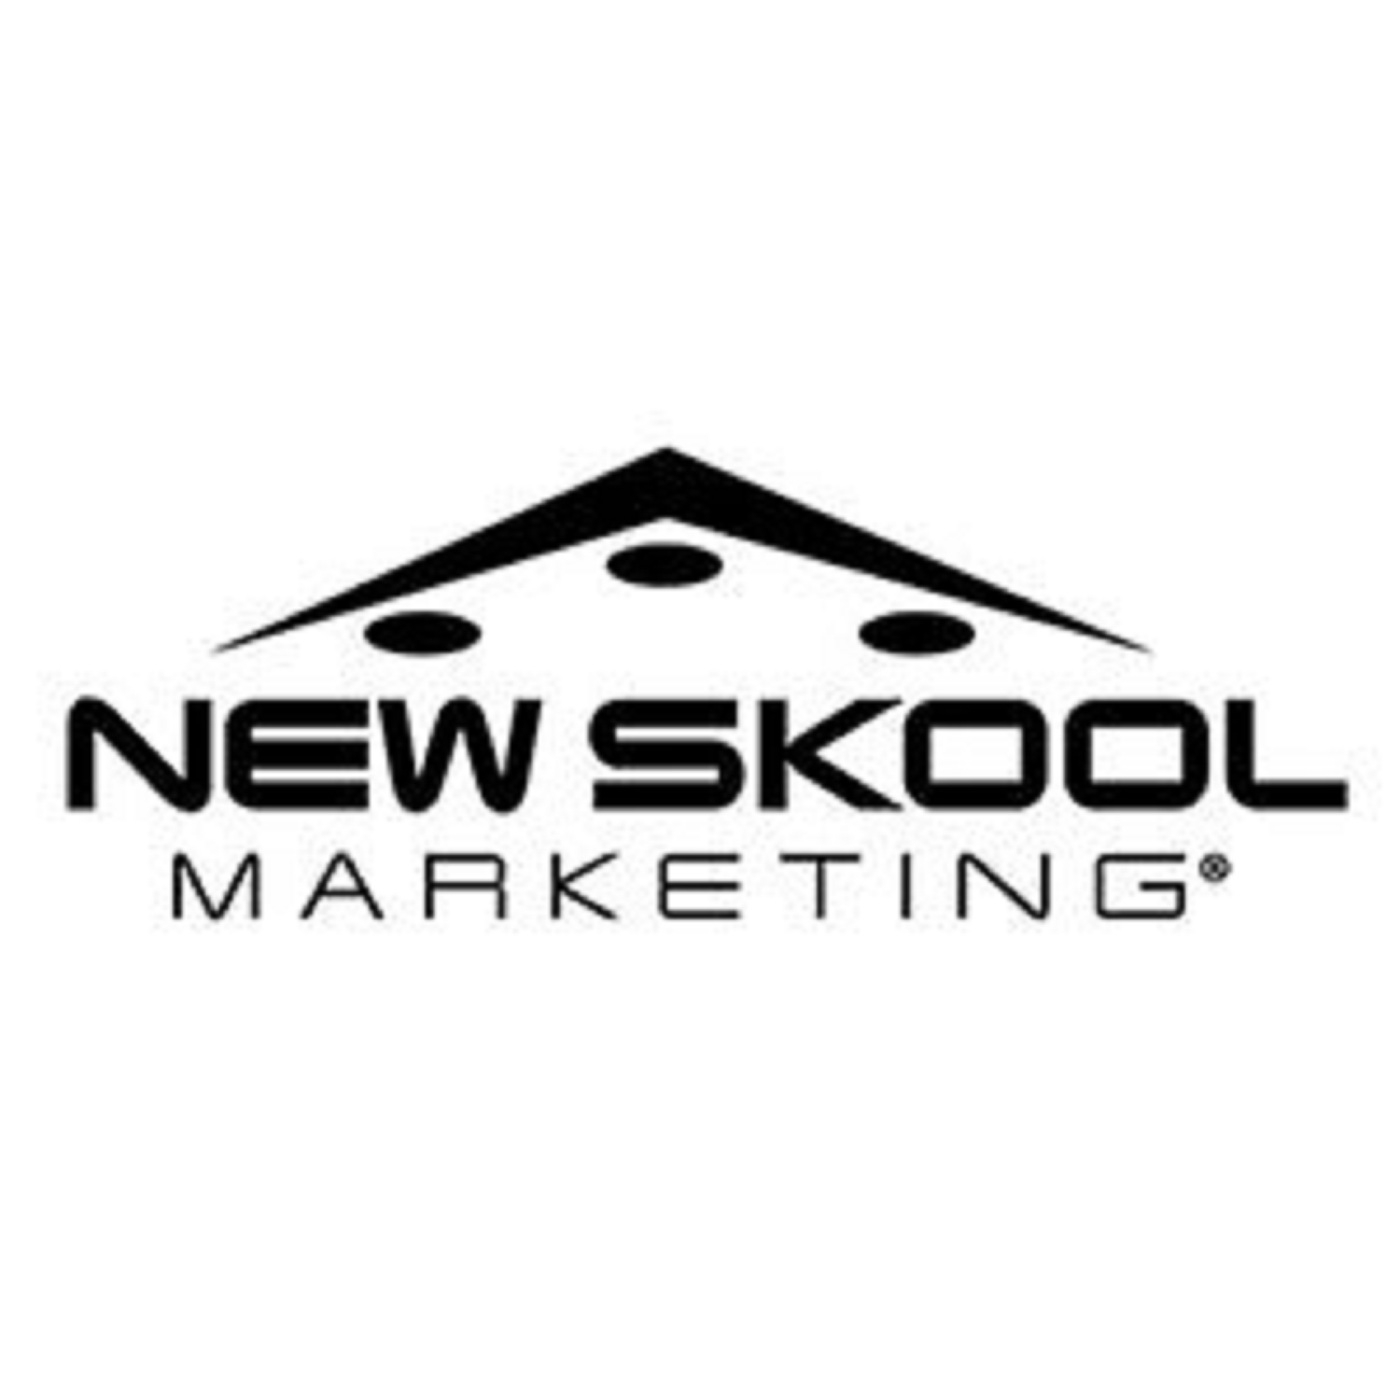 New Skool Marketing (@newskoolmarketing1) Cover Image